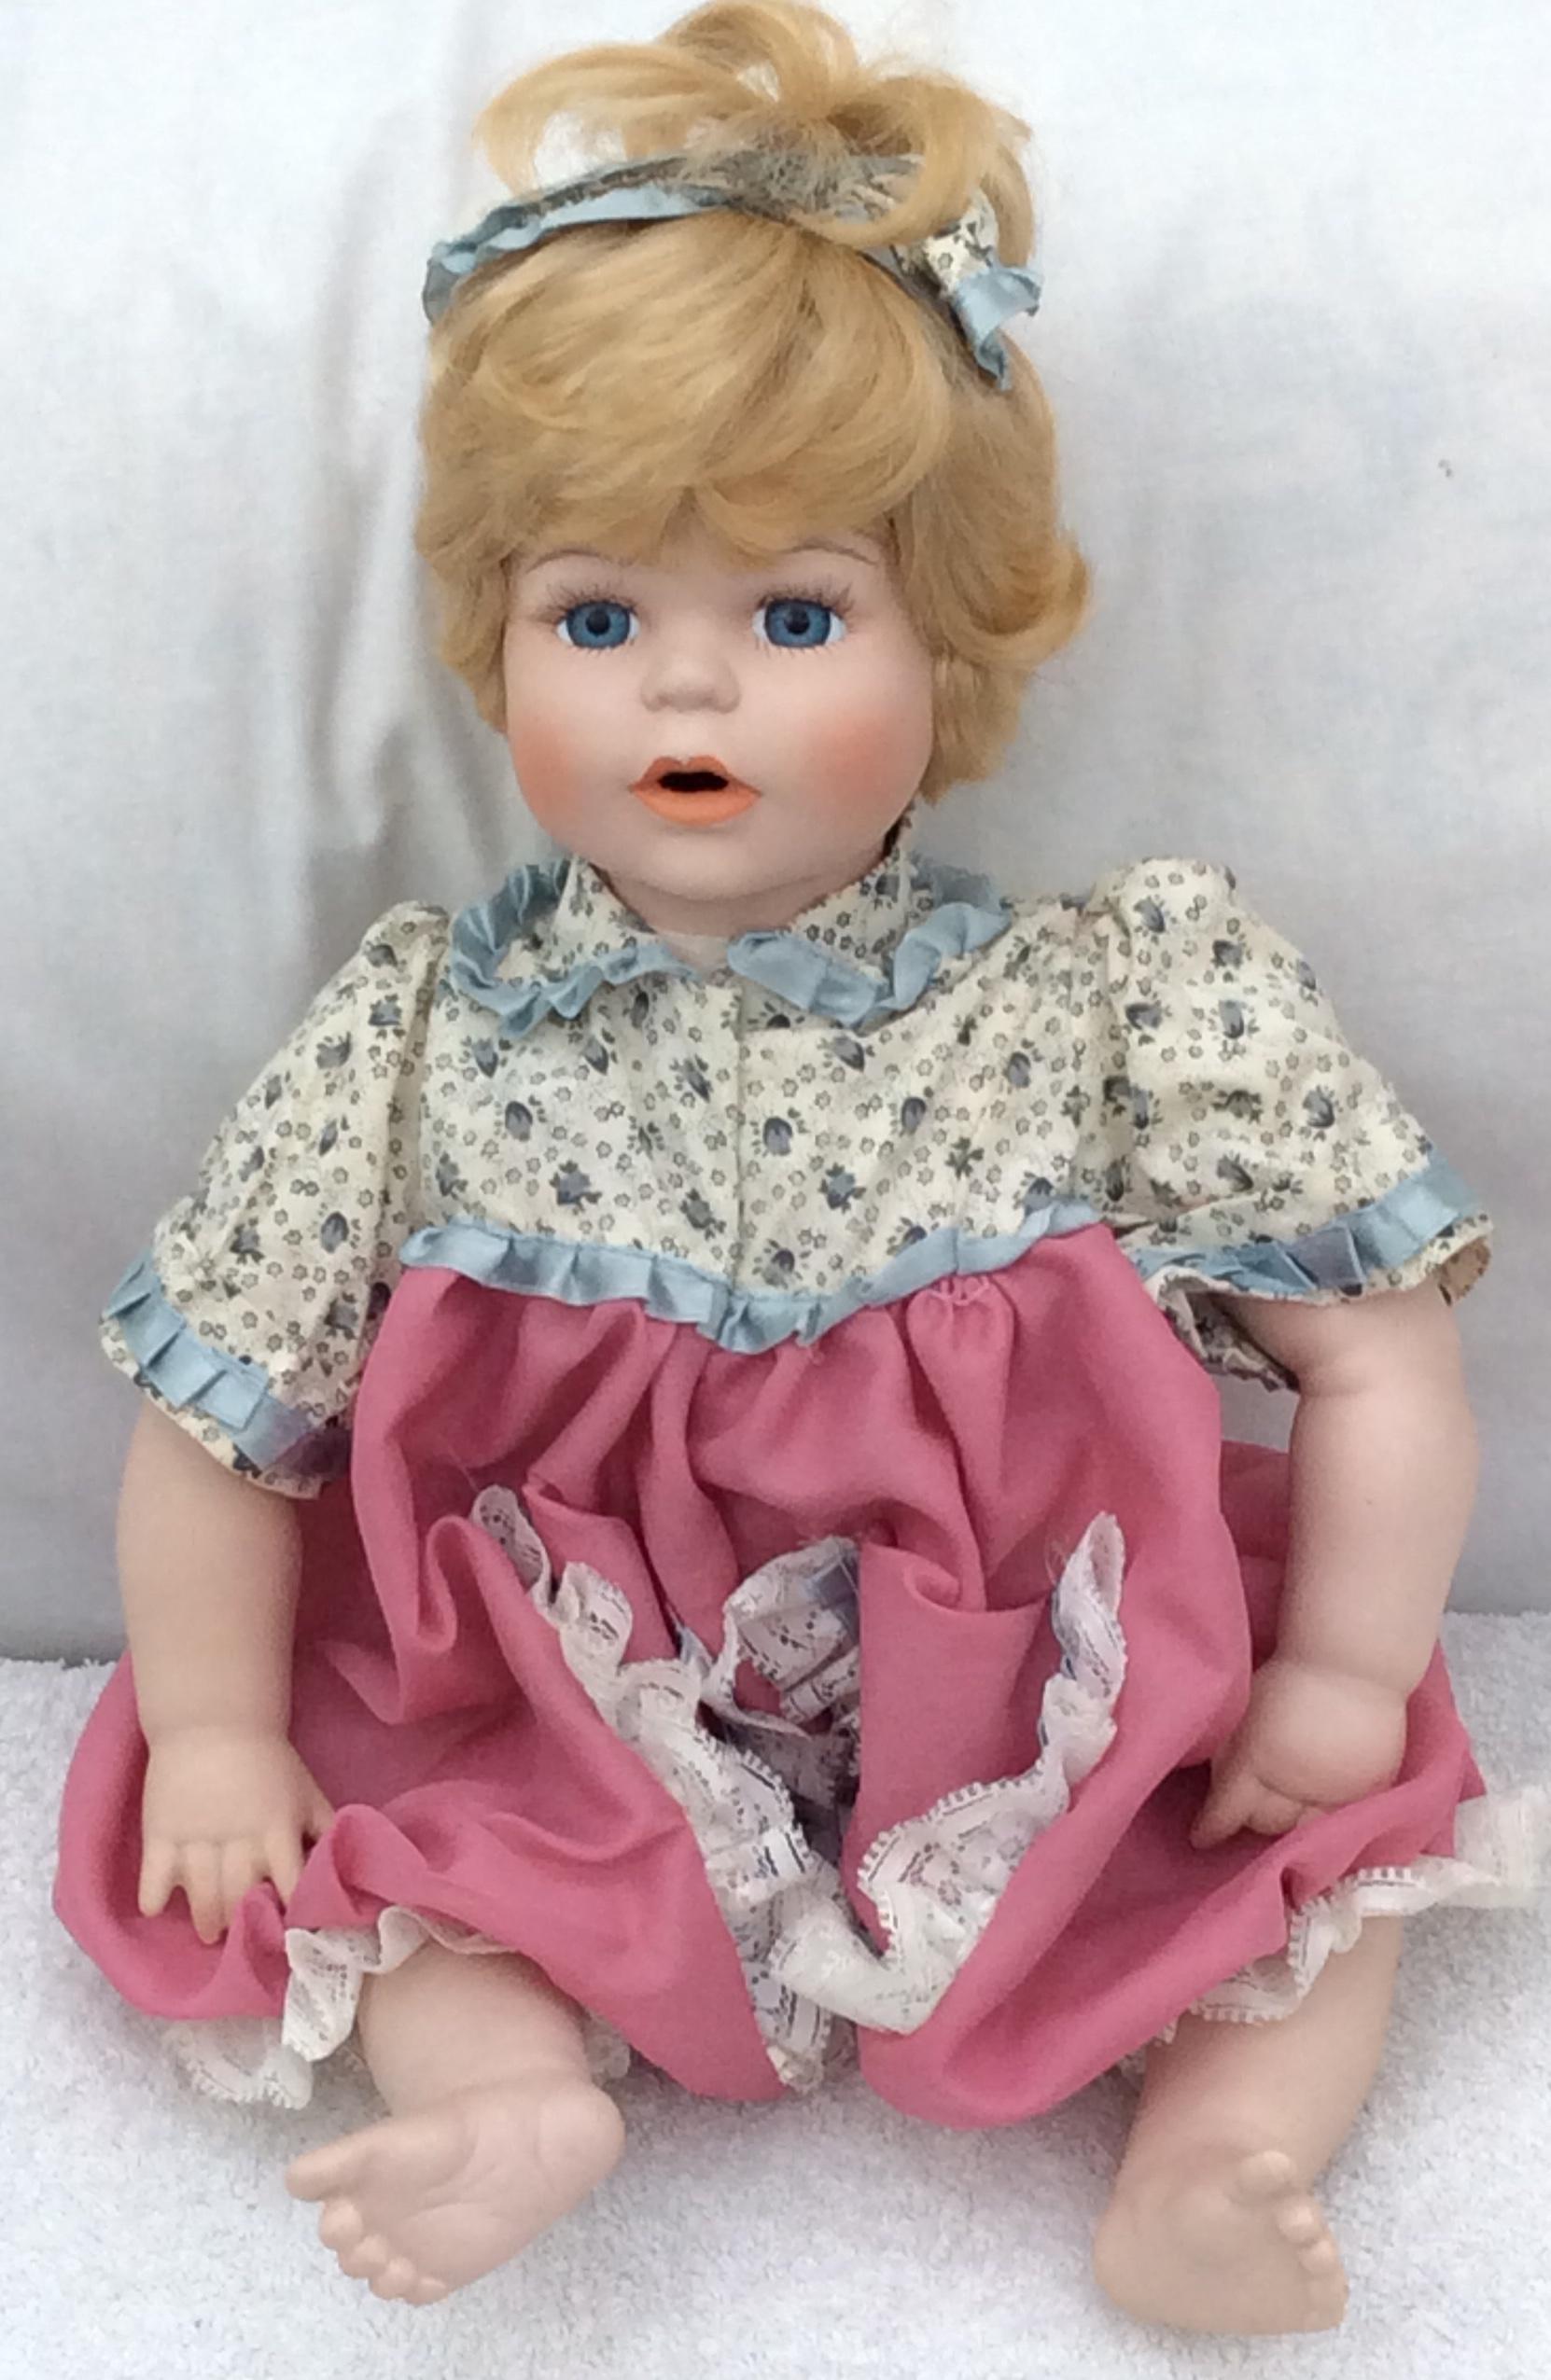 Vintage Collectable handmade porcelain doll